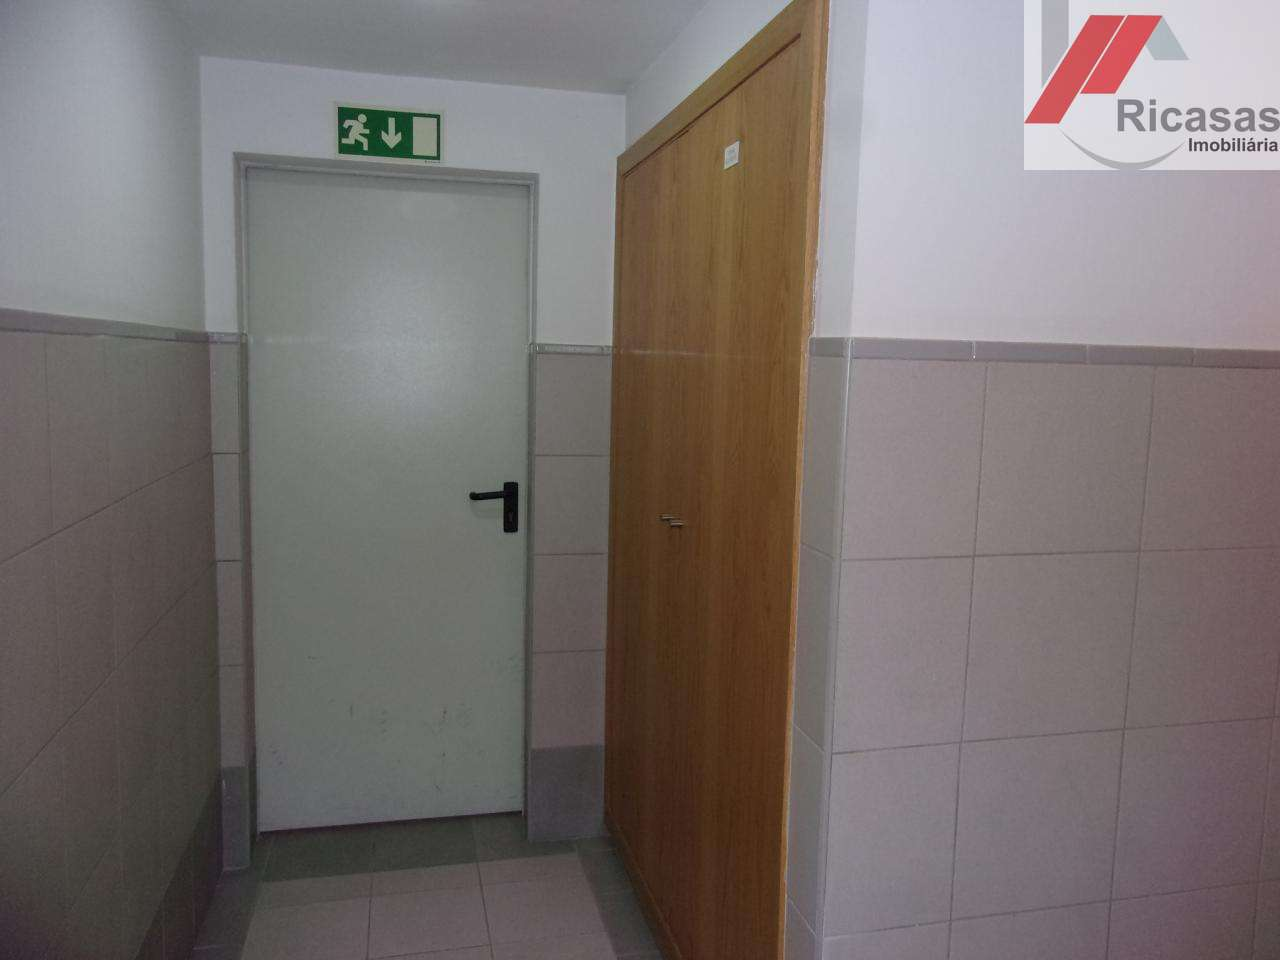 Apartamento para comprar, Marvila, Lisboa - Foto 30